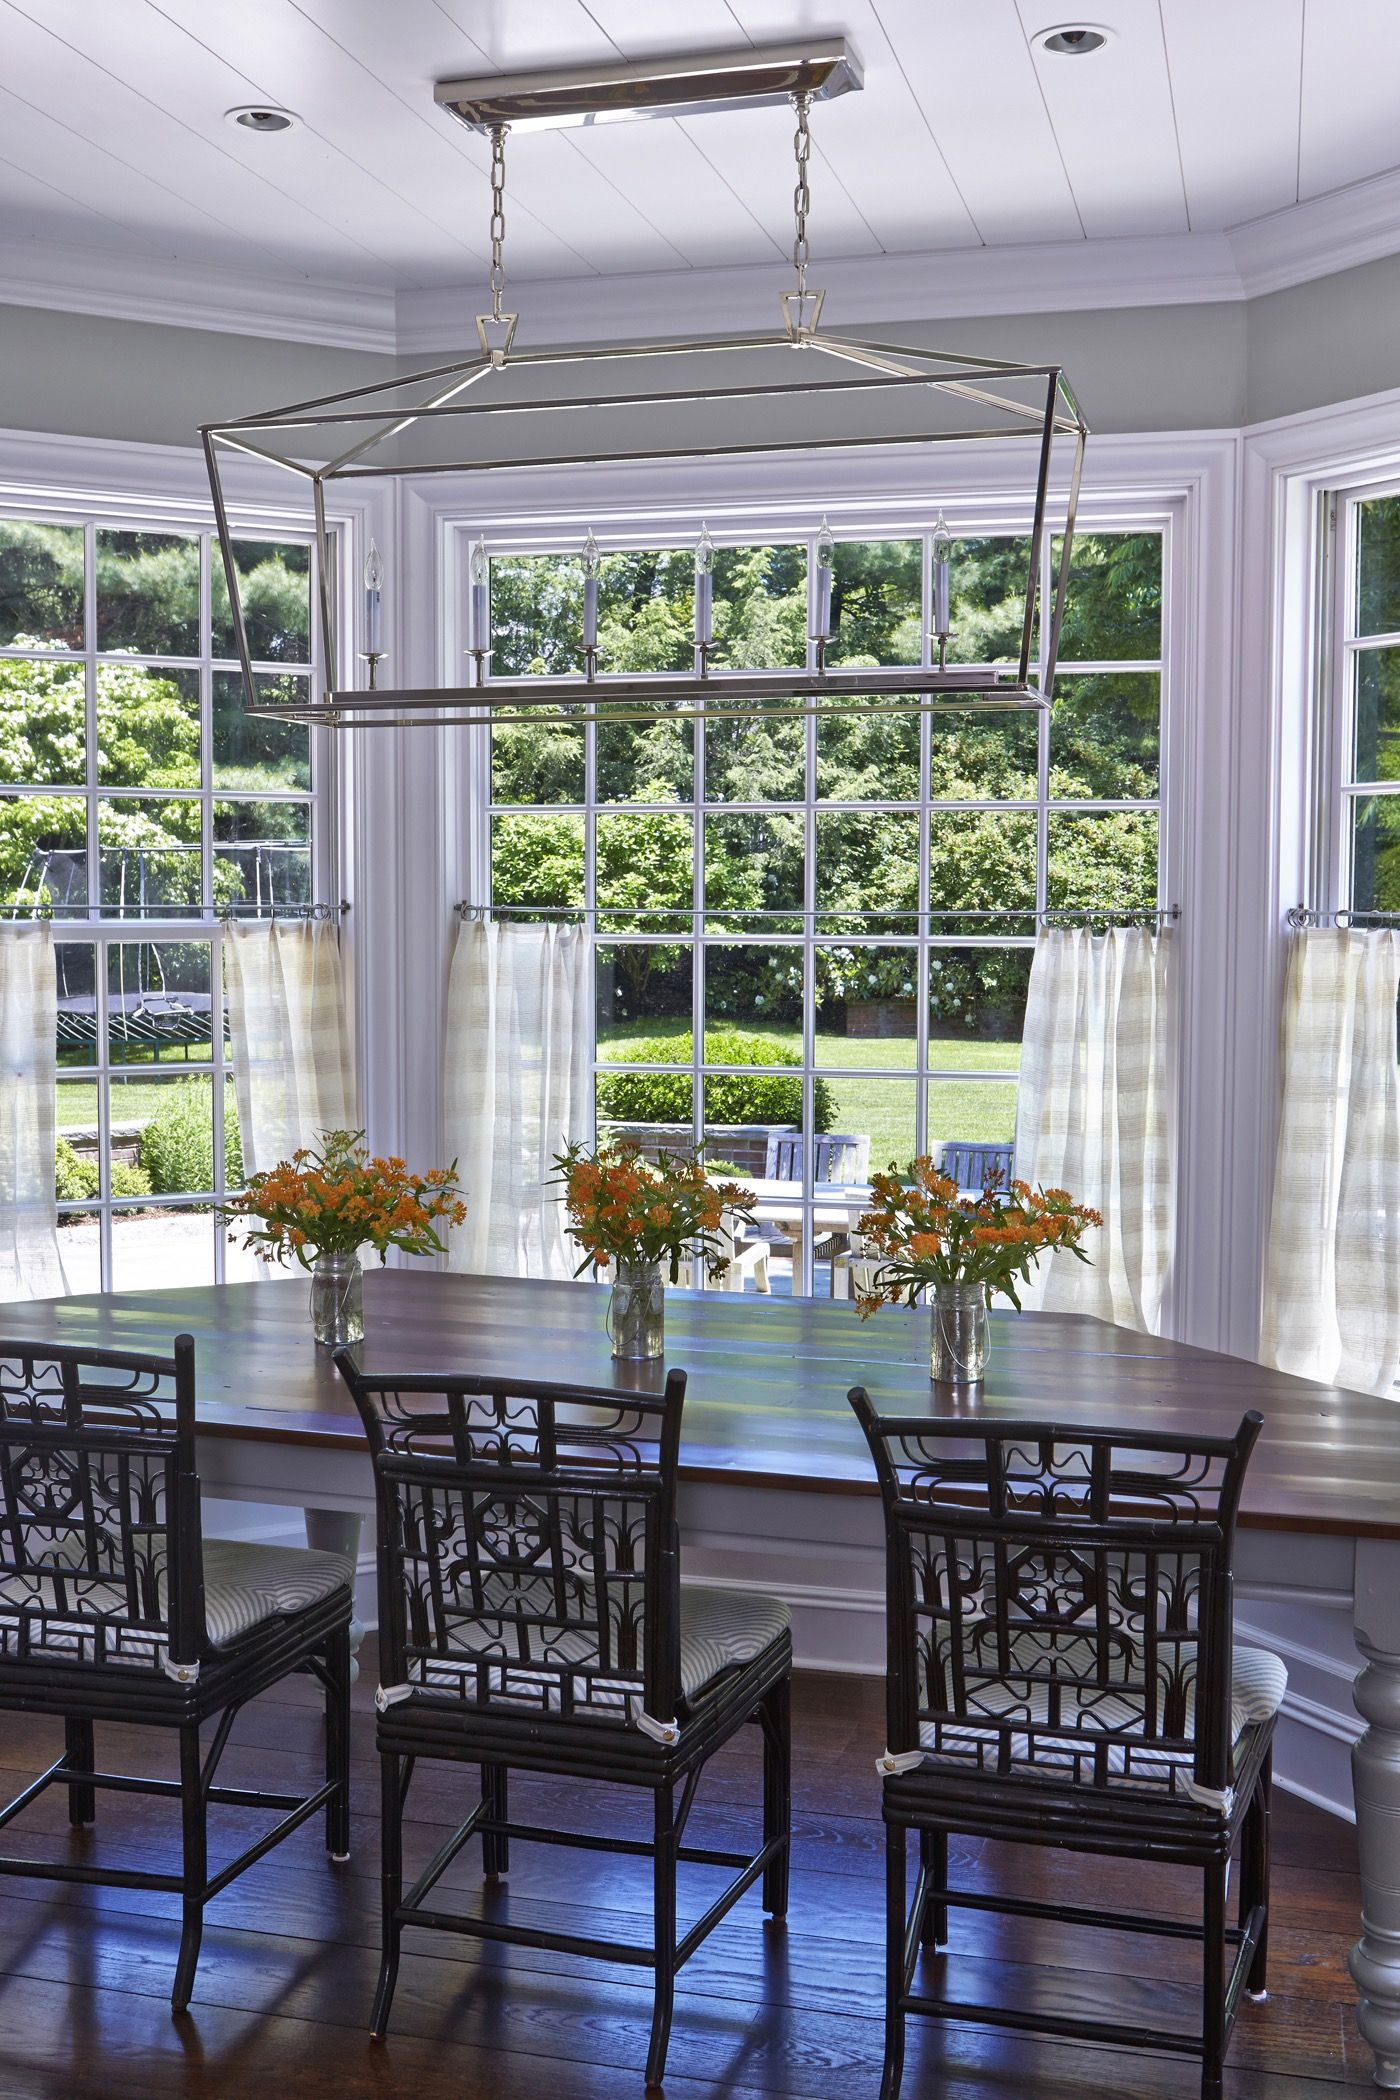 Kitchen nook window treatments  sunroom with large windows  window treatments  pinterest  sunroom